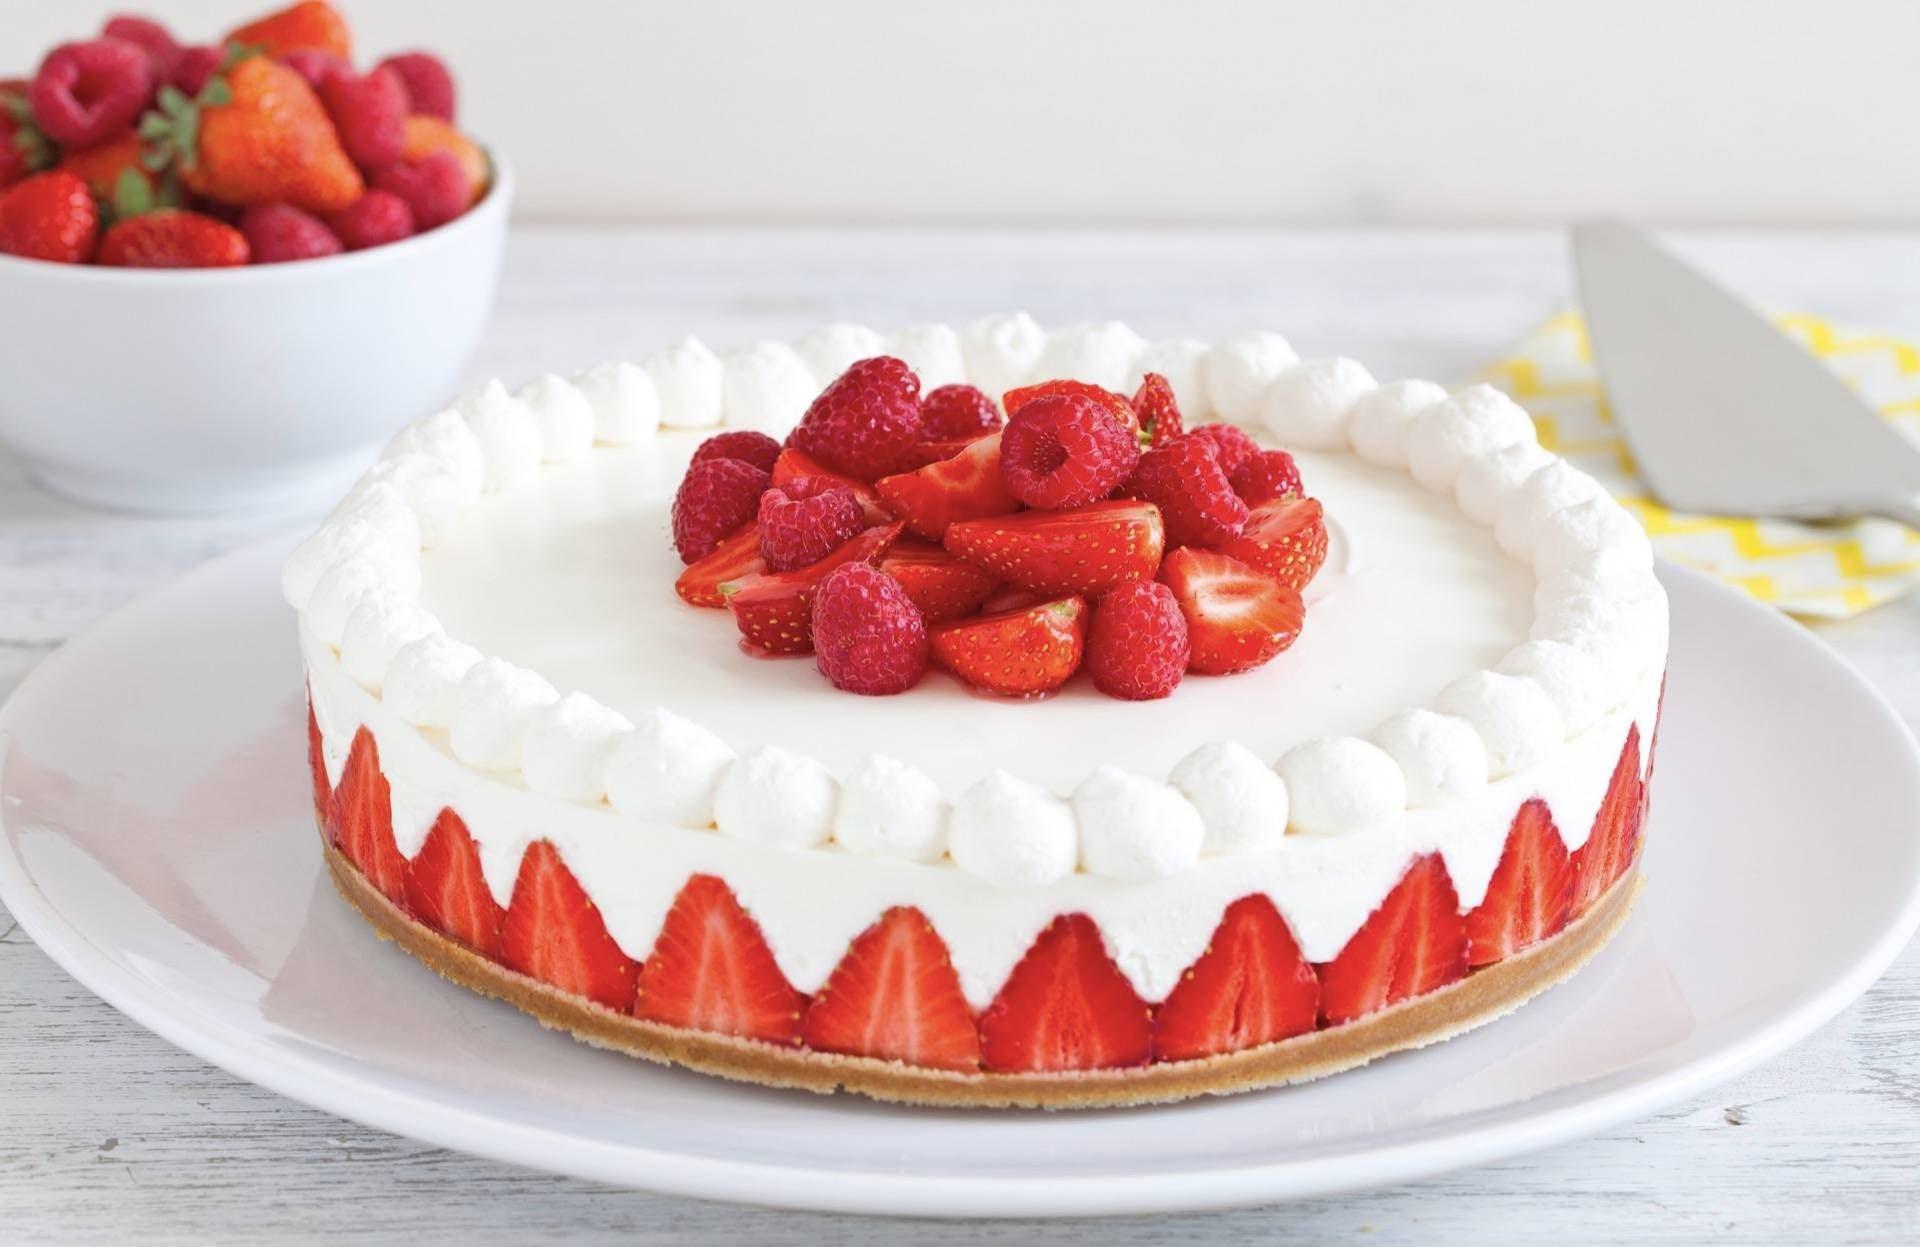 Ricetta Torta Allo Yogurt Fragole E Panna Chef